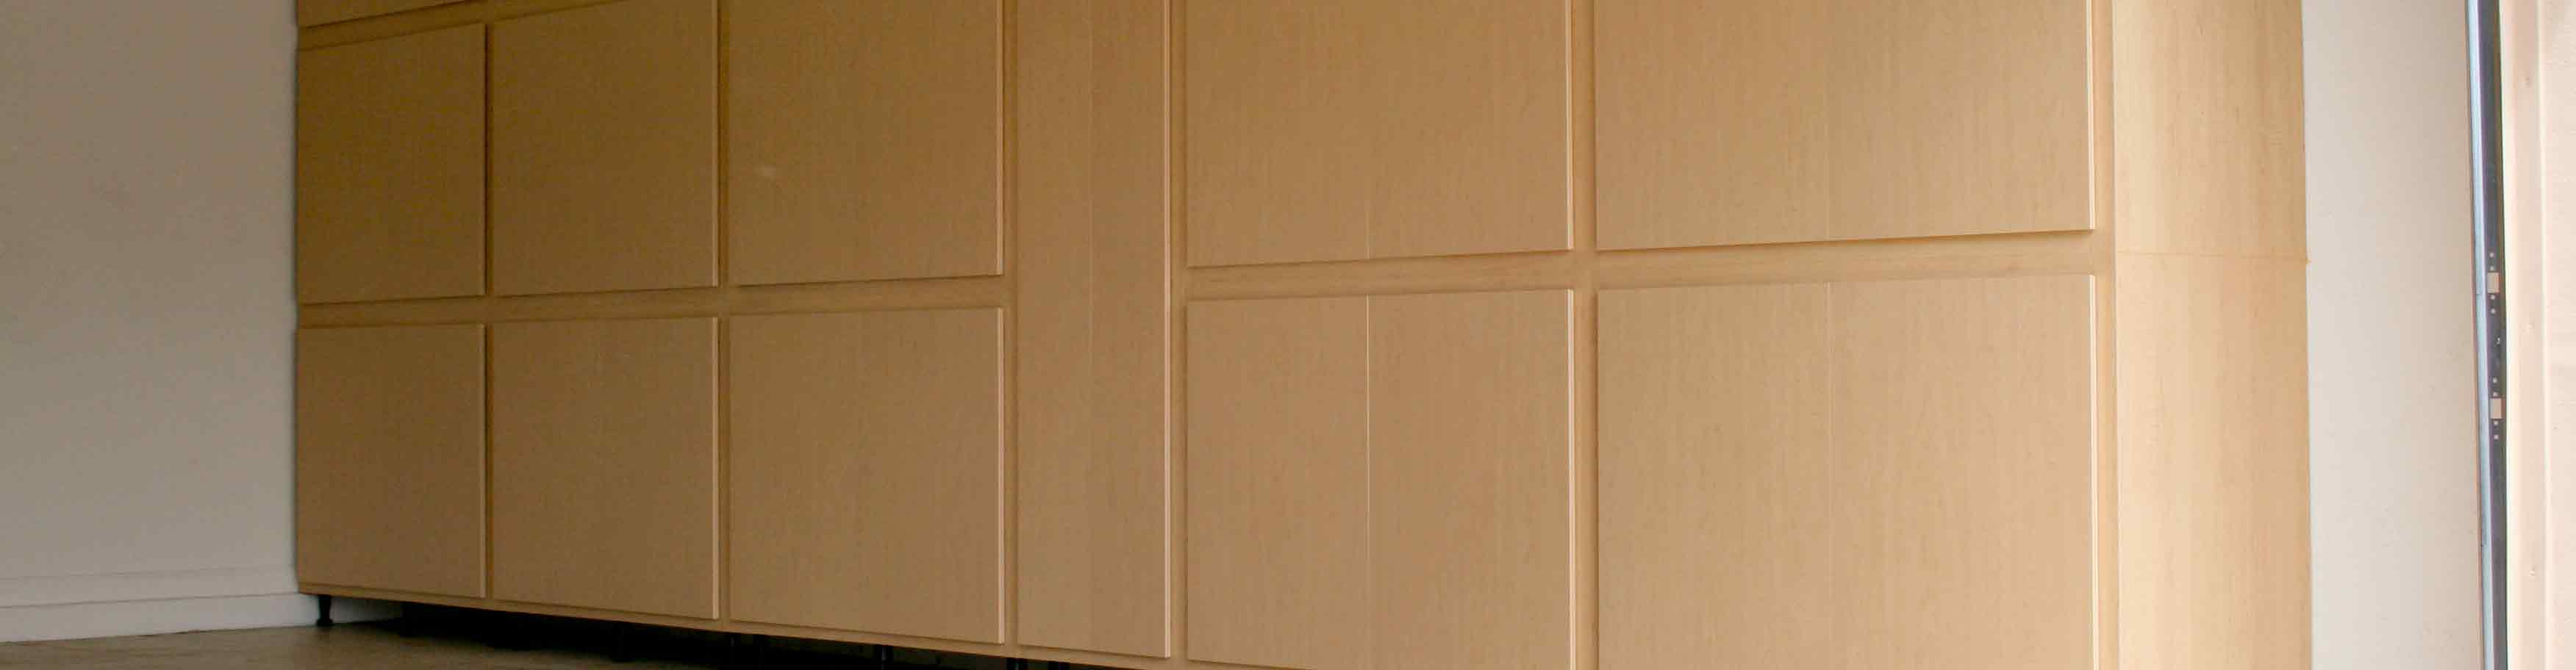 Merveilleux Garage Cabinet Doors